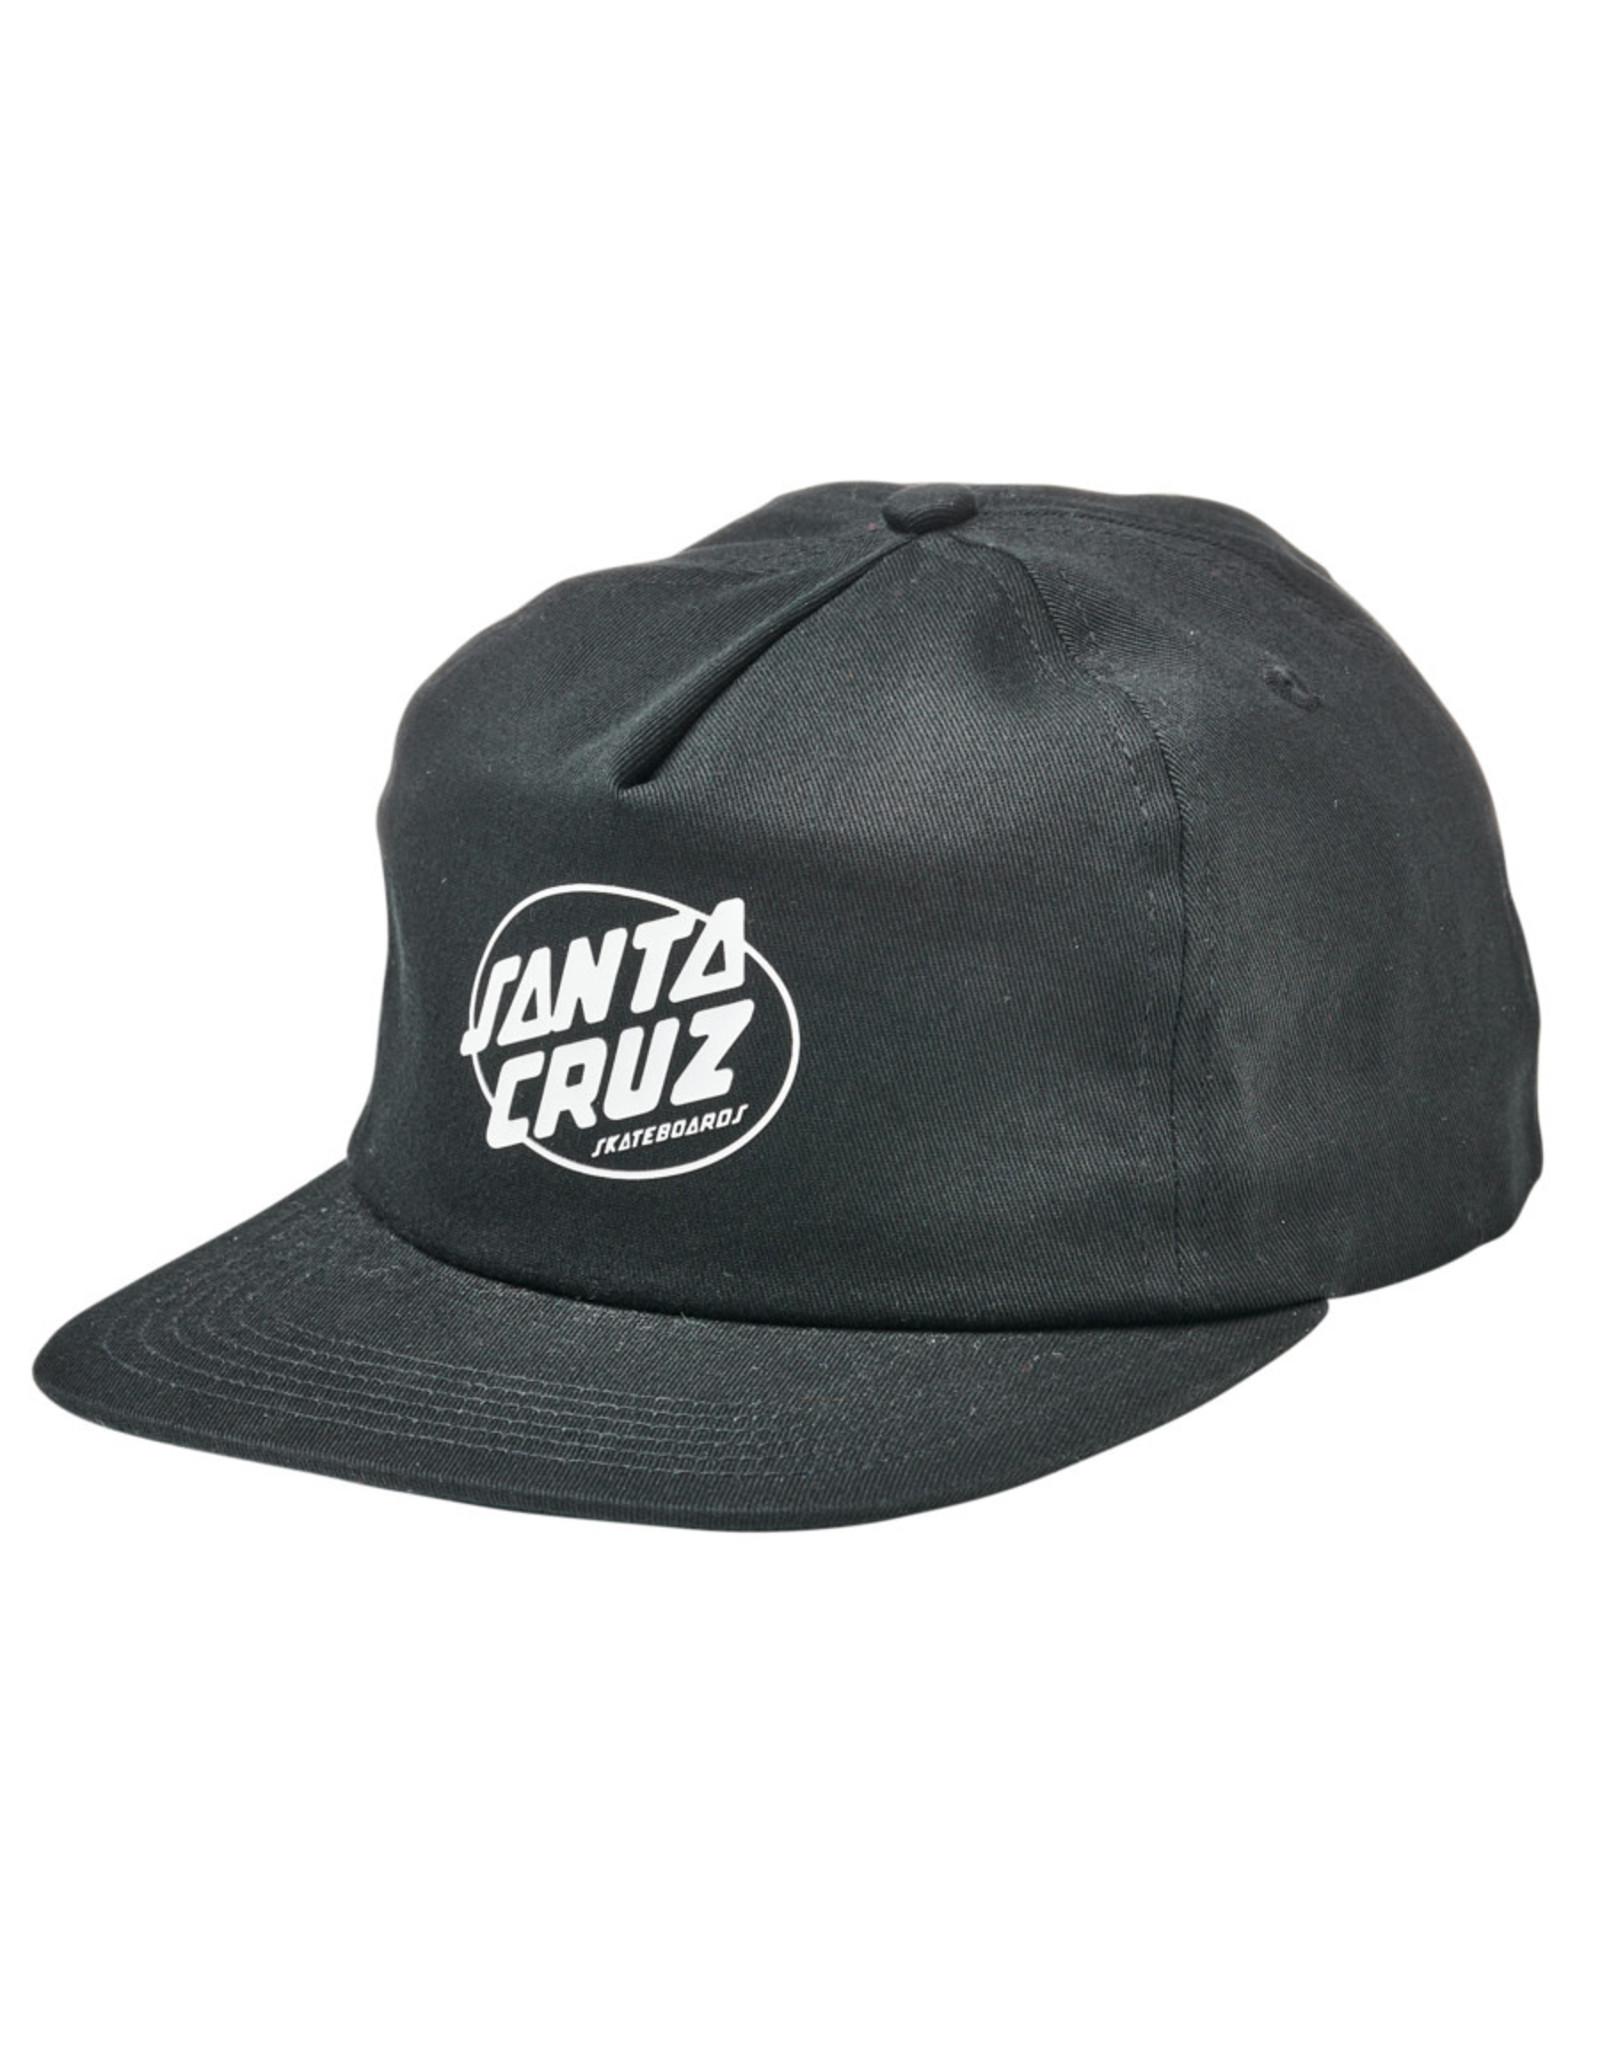 Santa Cruz Santa Cruz Hat Club Oval Dot Unstructured Mid Snapback (Black)